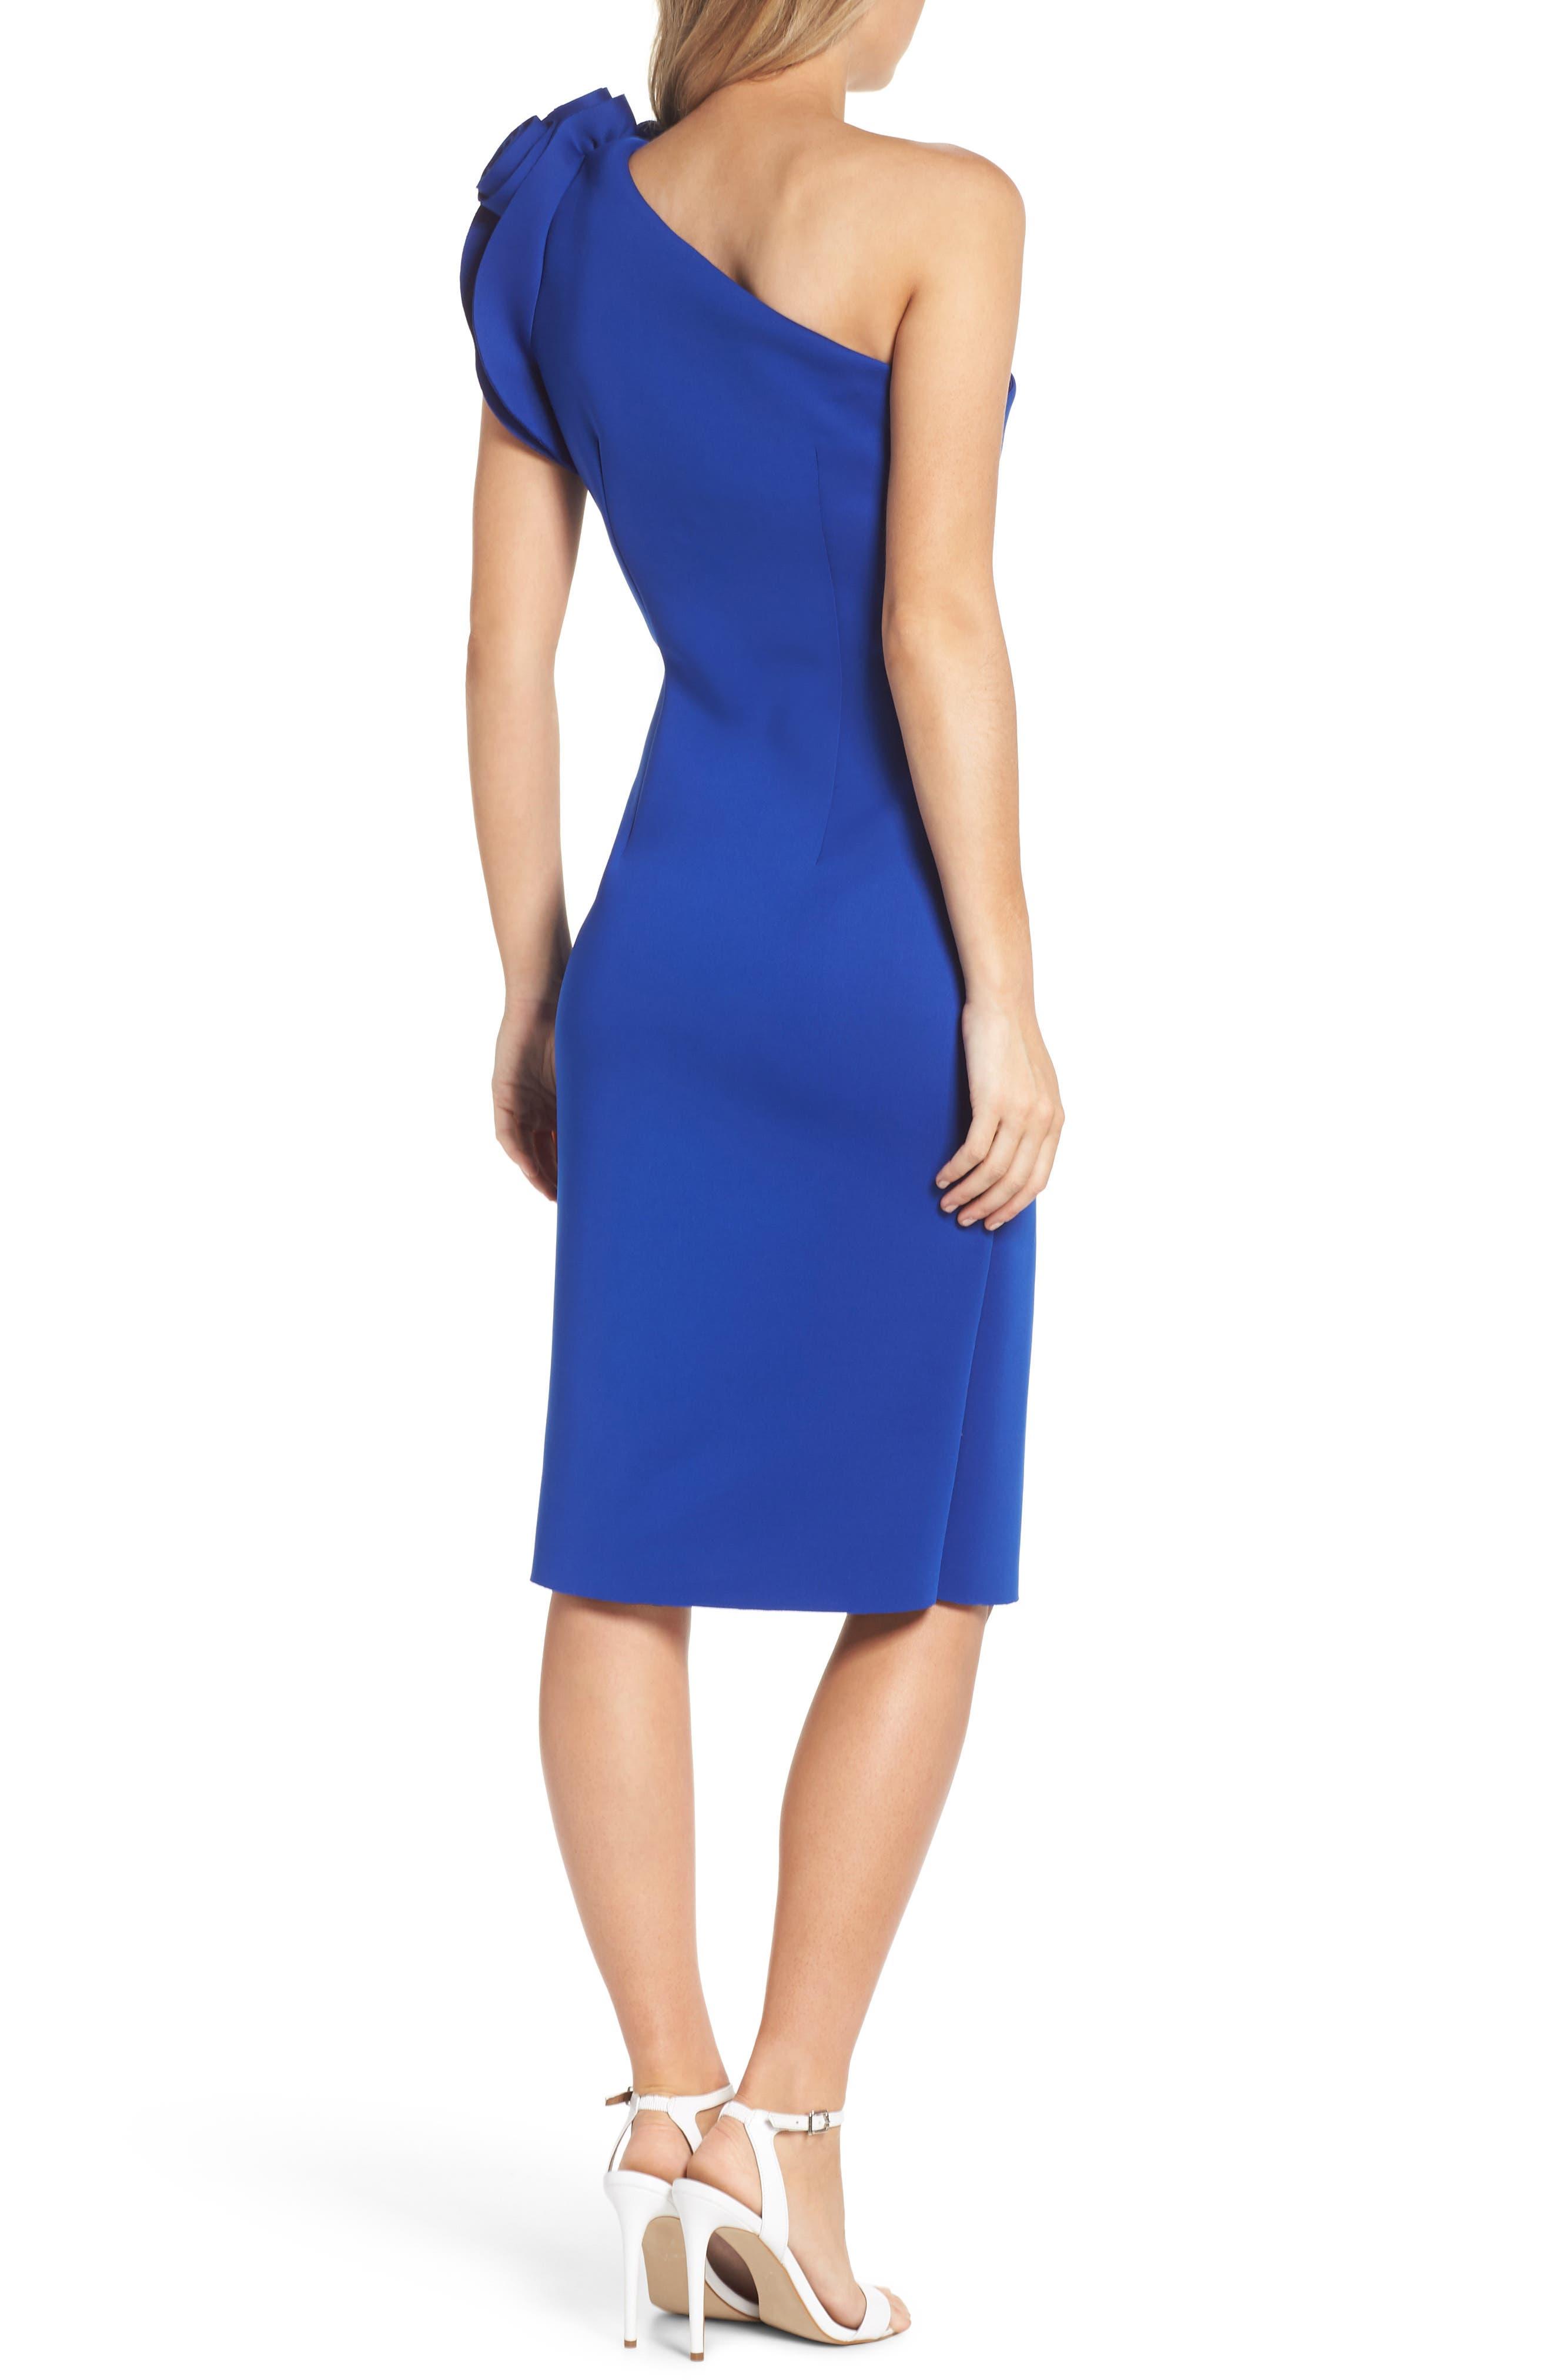 9c53c308f3 Women s One Shoulder Dresses